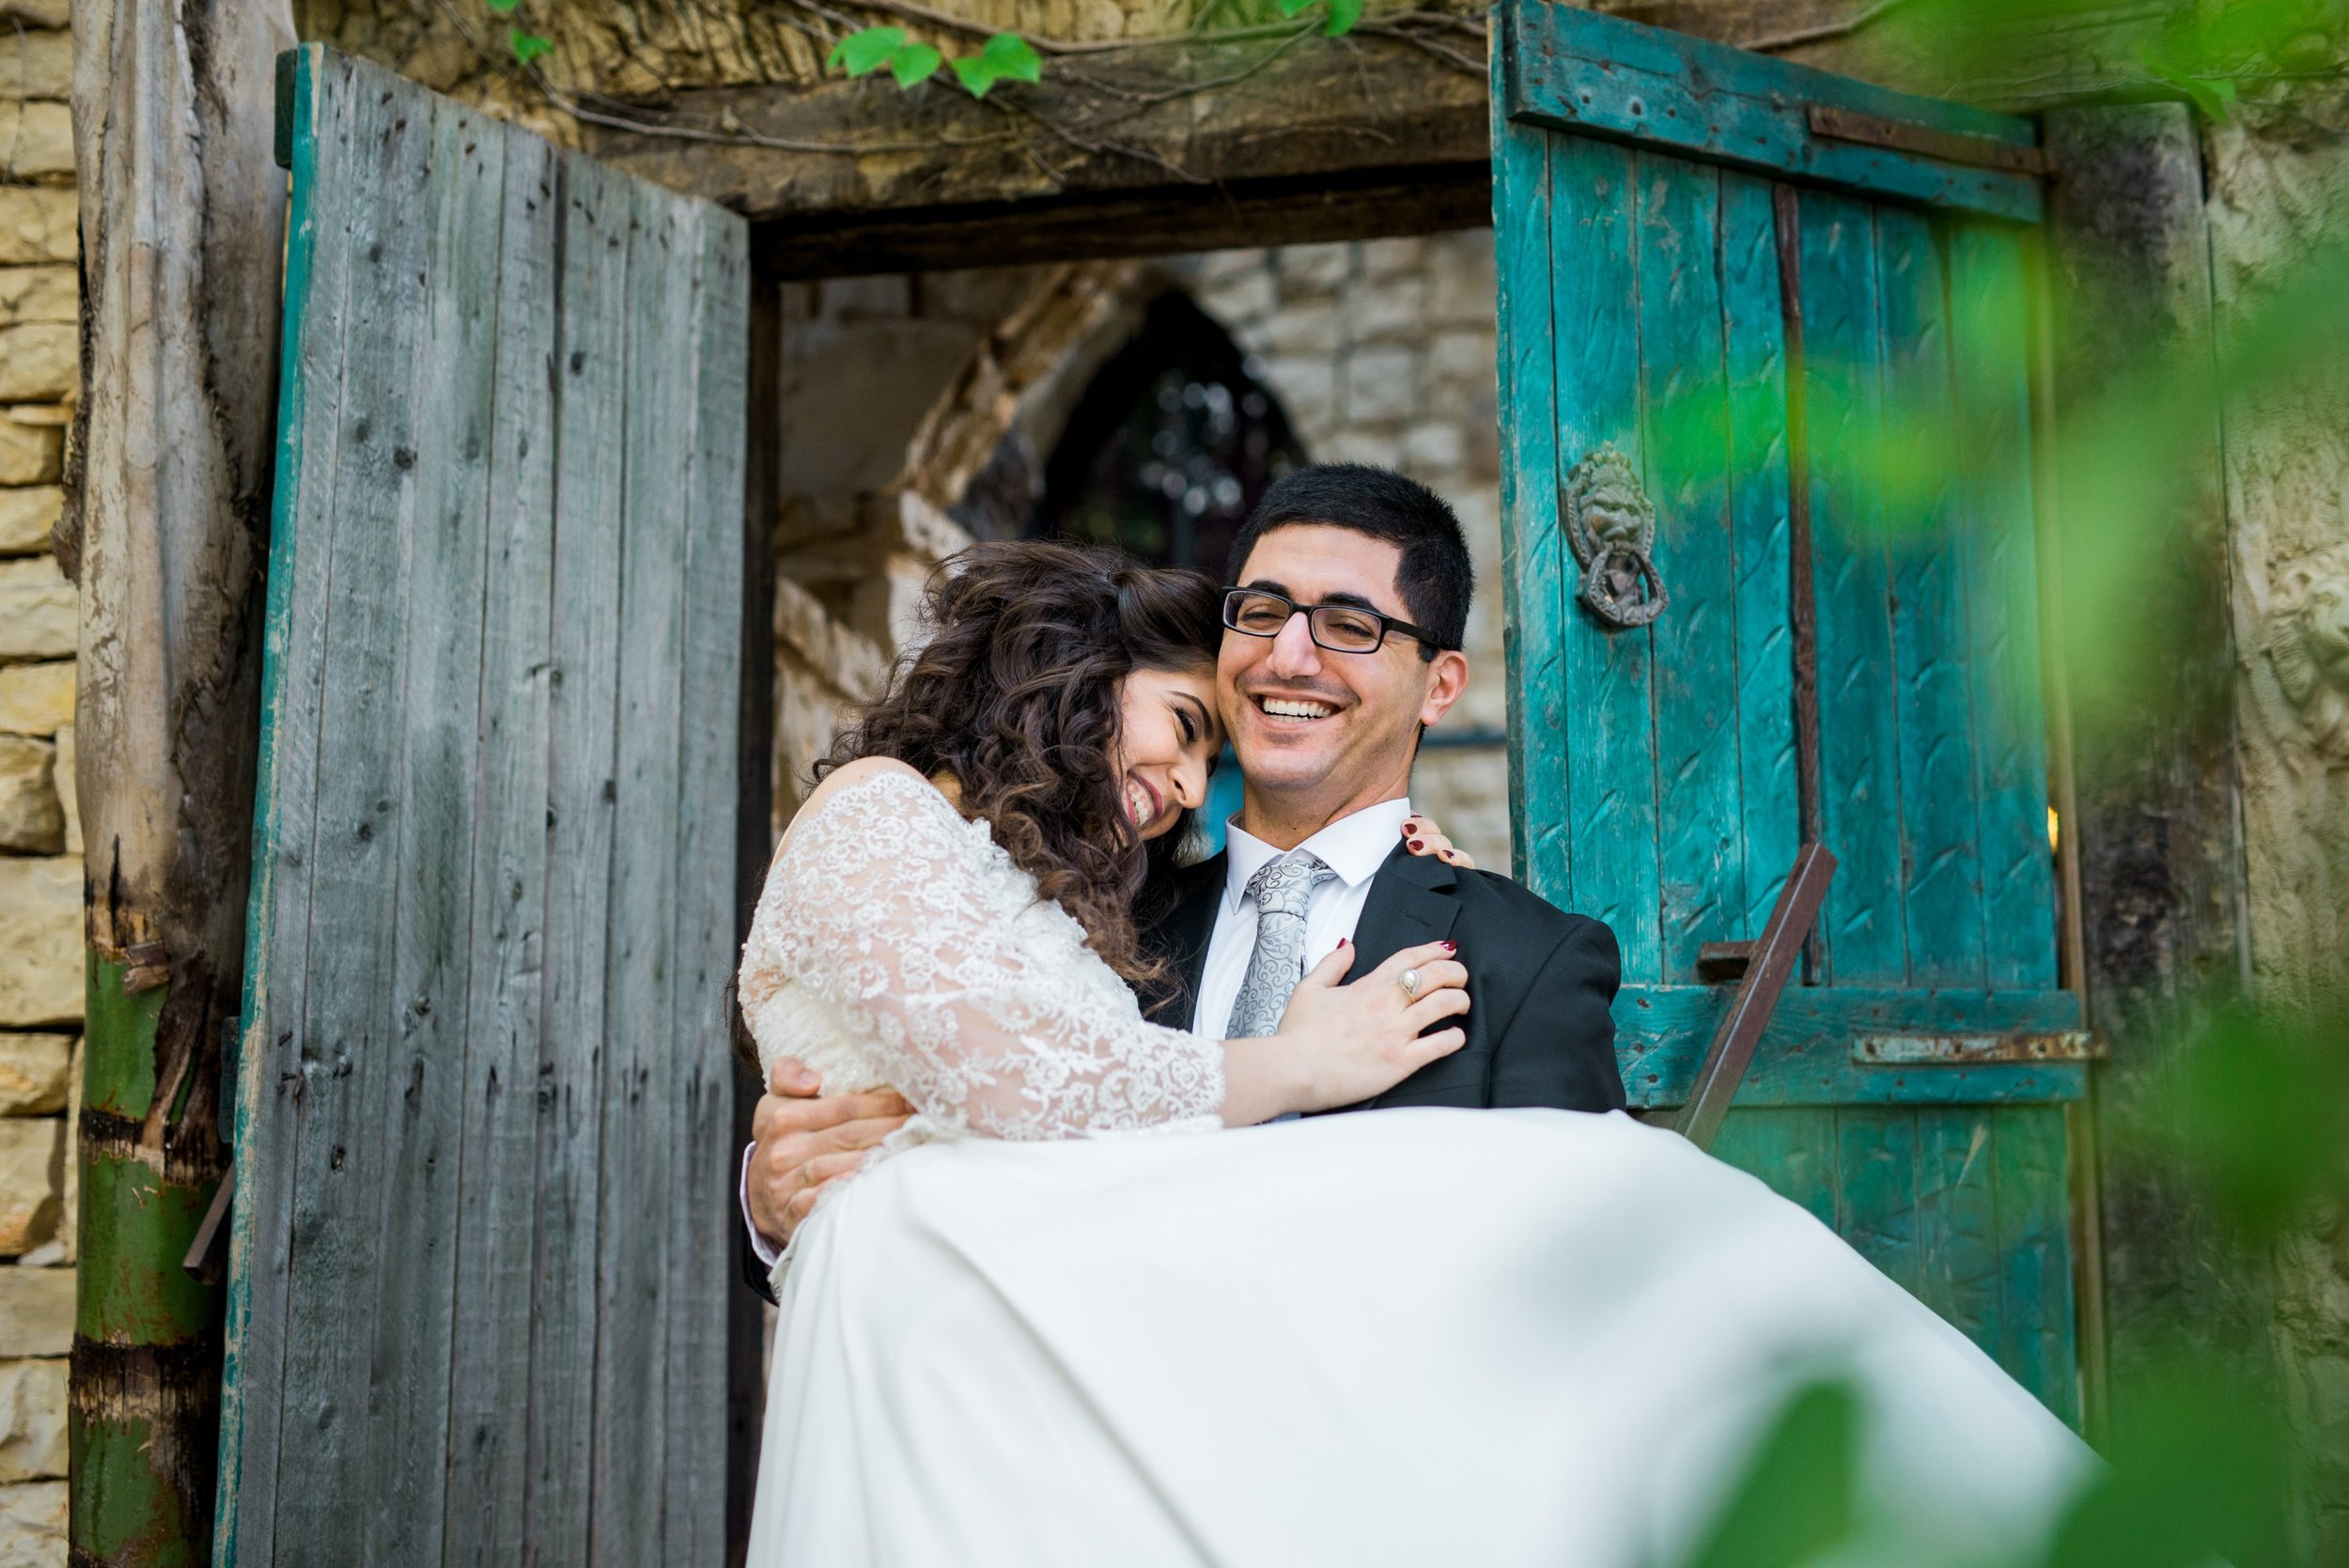 israel-garden-wedding-portraits-session-kate-giryes-photography--14_WEB.jpg